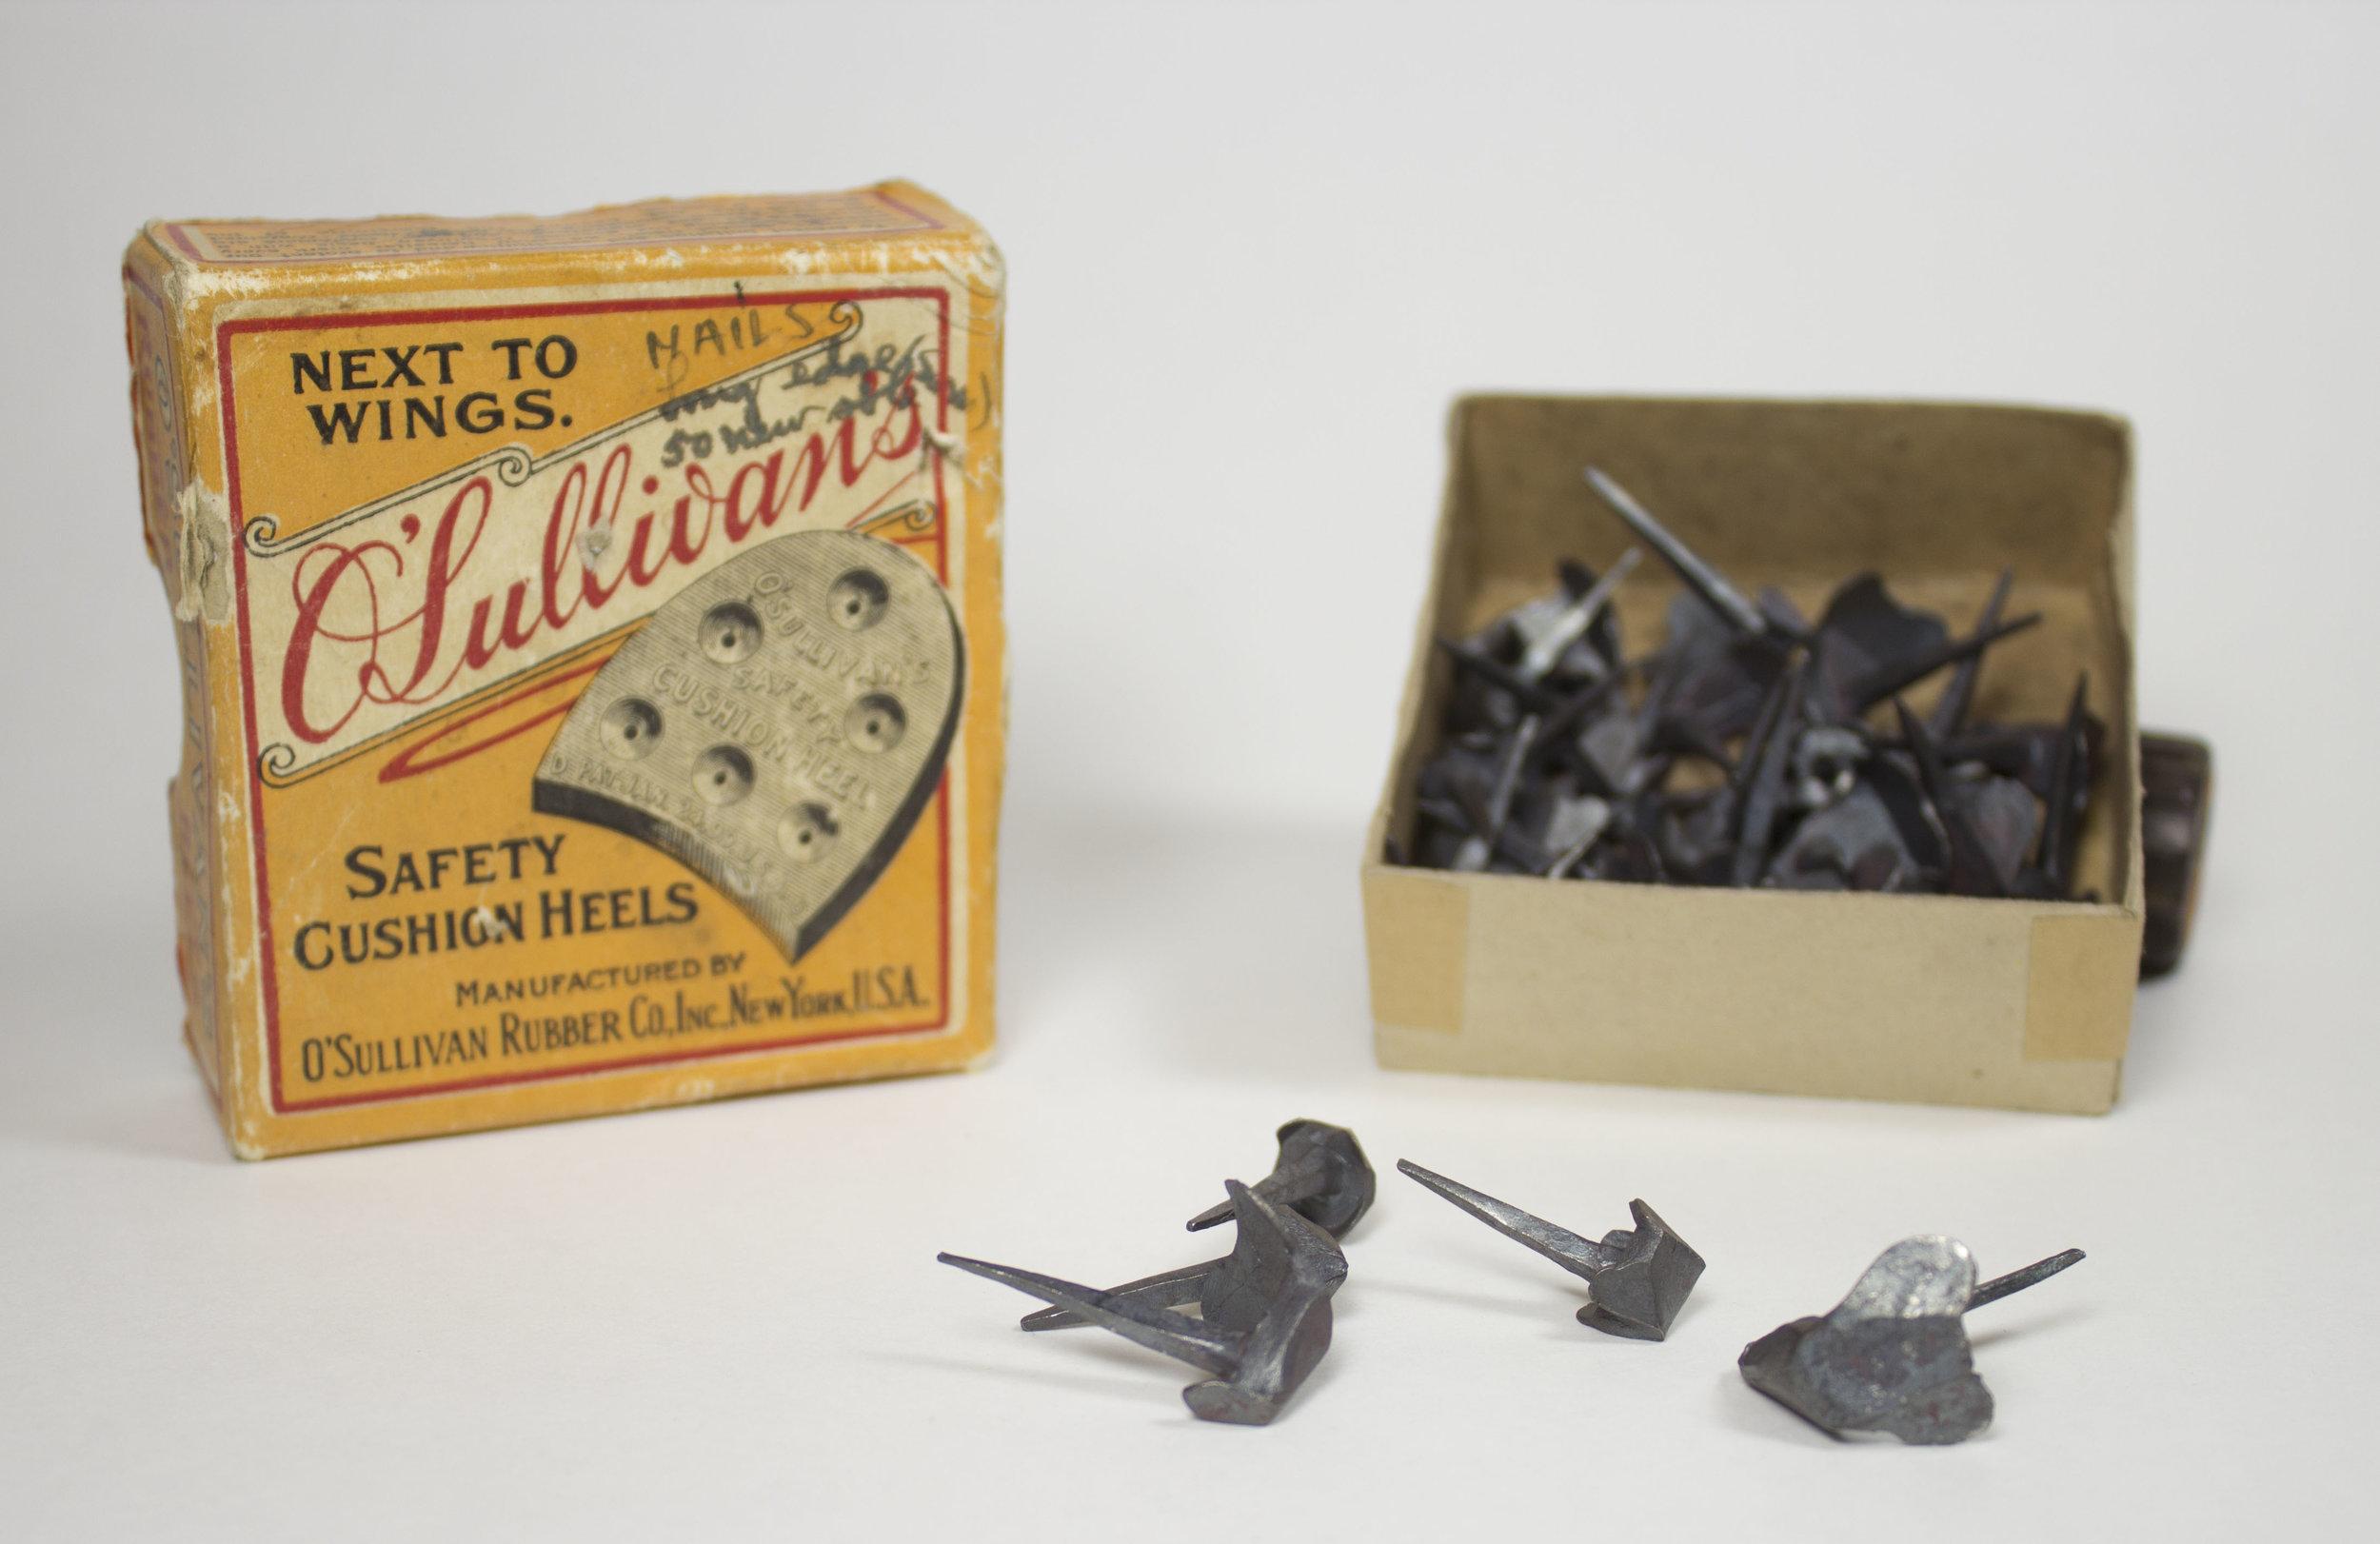 Original hobnails, stored in a reused box